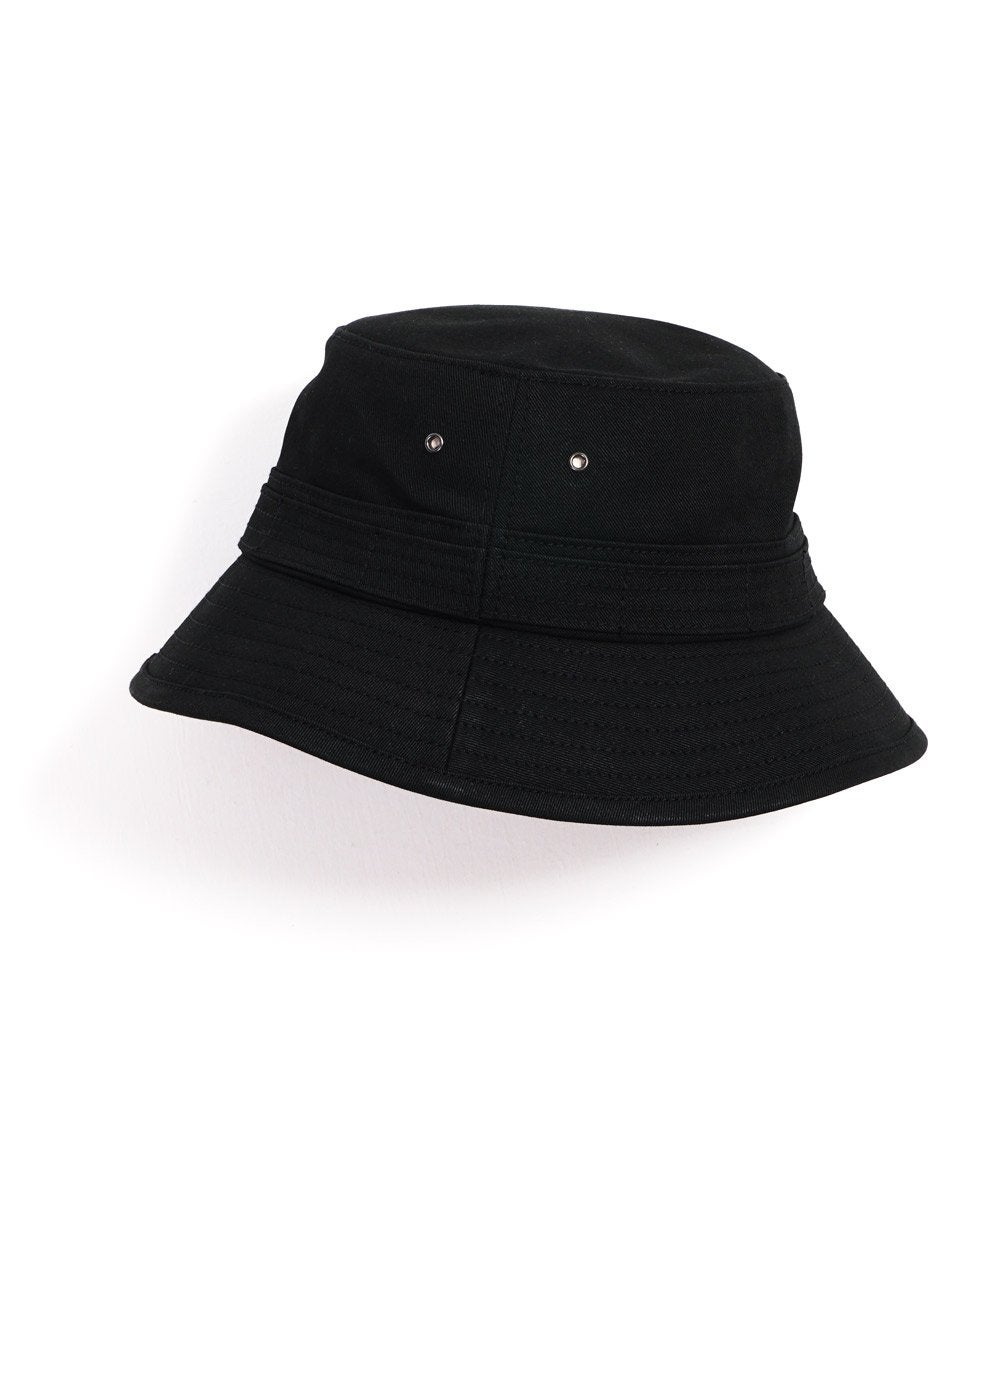 Hansen Garments EDVARD | Bucket Hat | var. colors